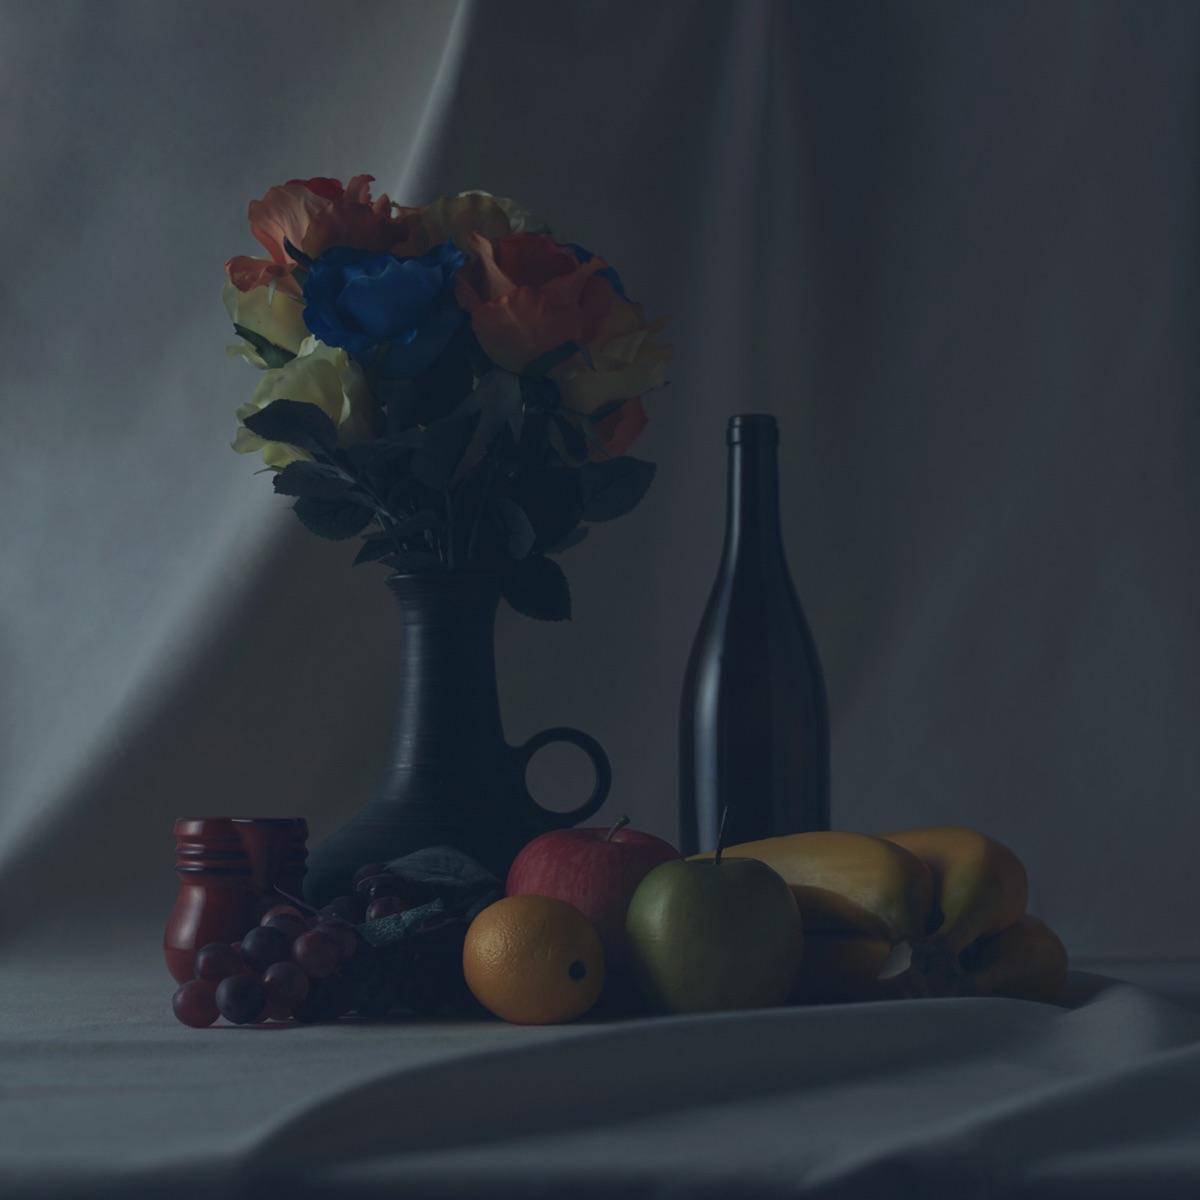 『GRAPEVINE - 目覚ましはいつも鳴りやまない』収録の『新しい果実』ジャケット